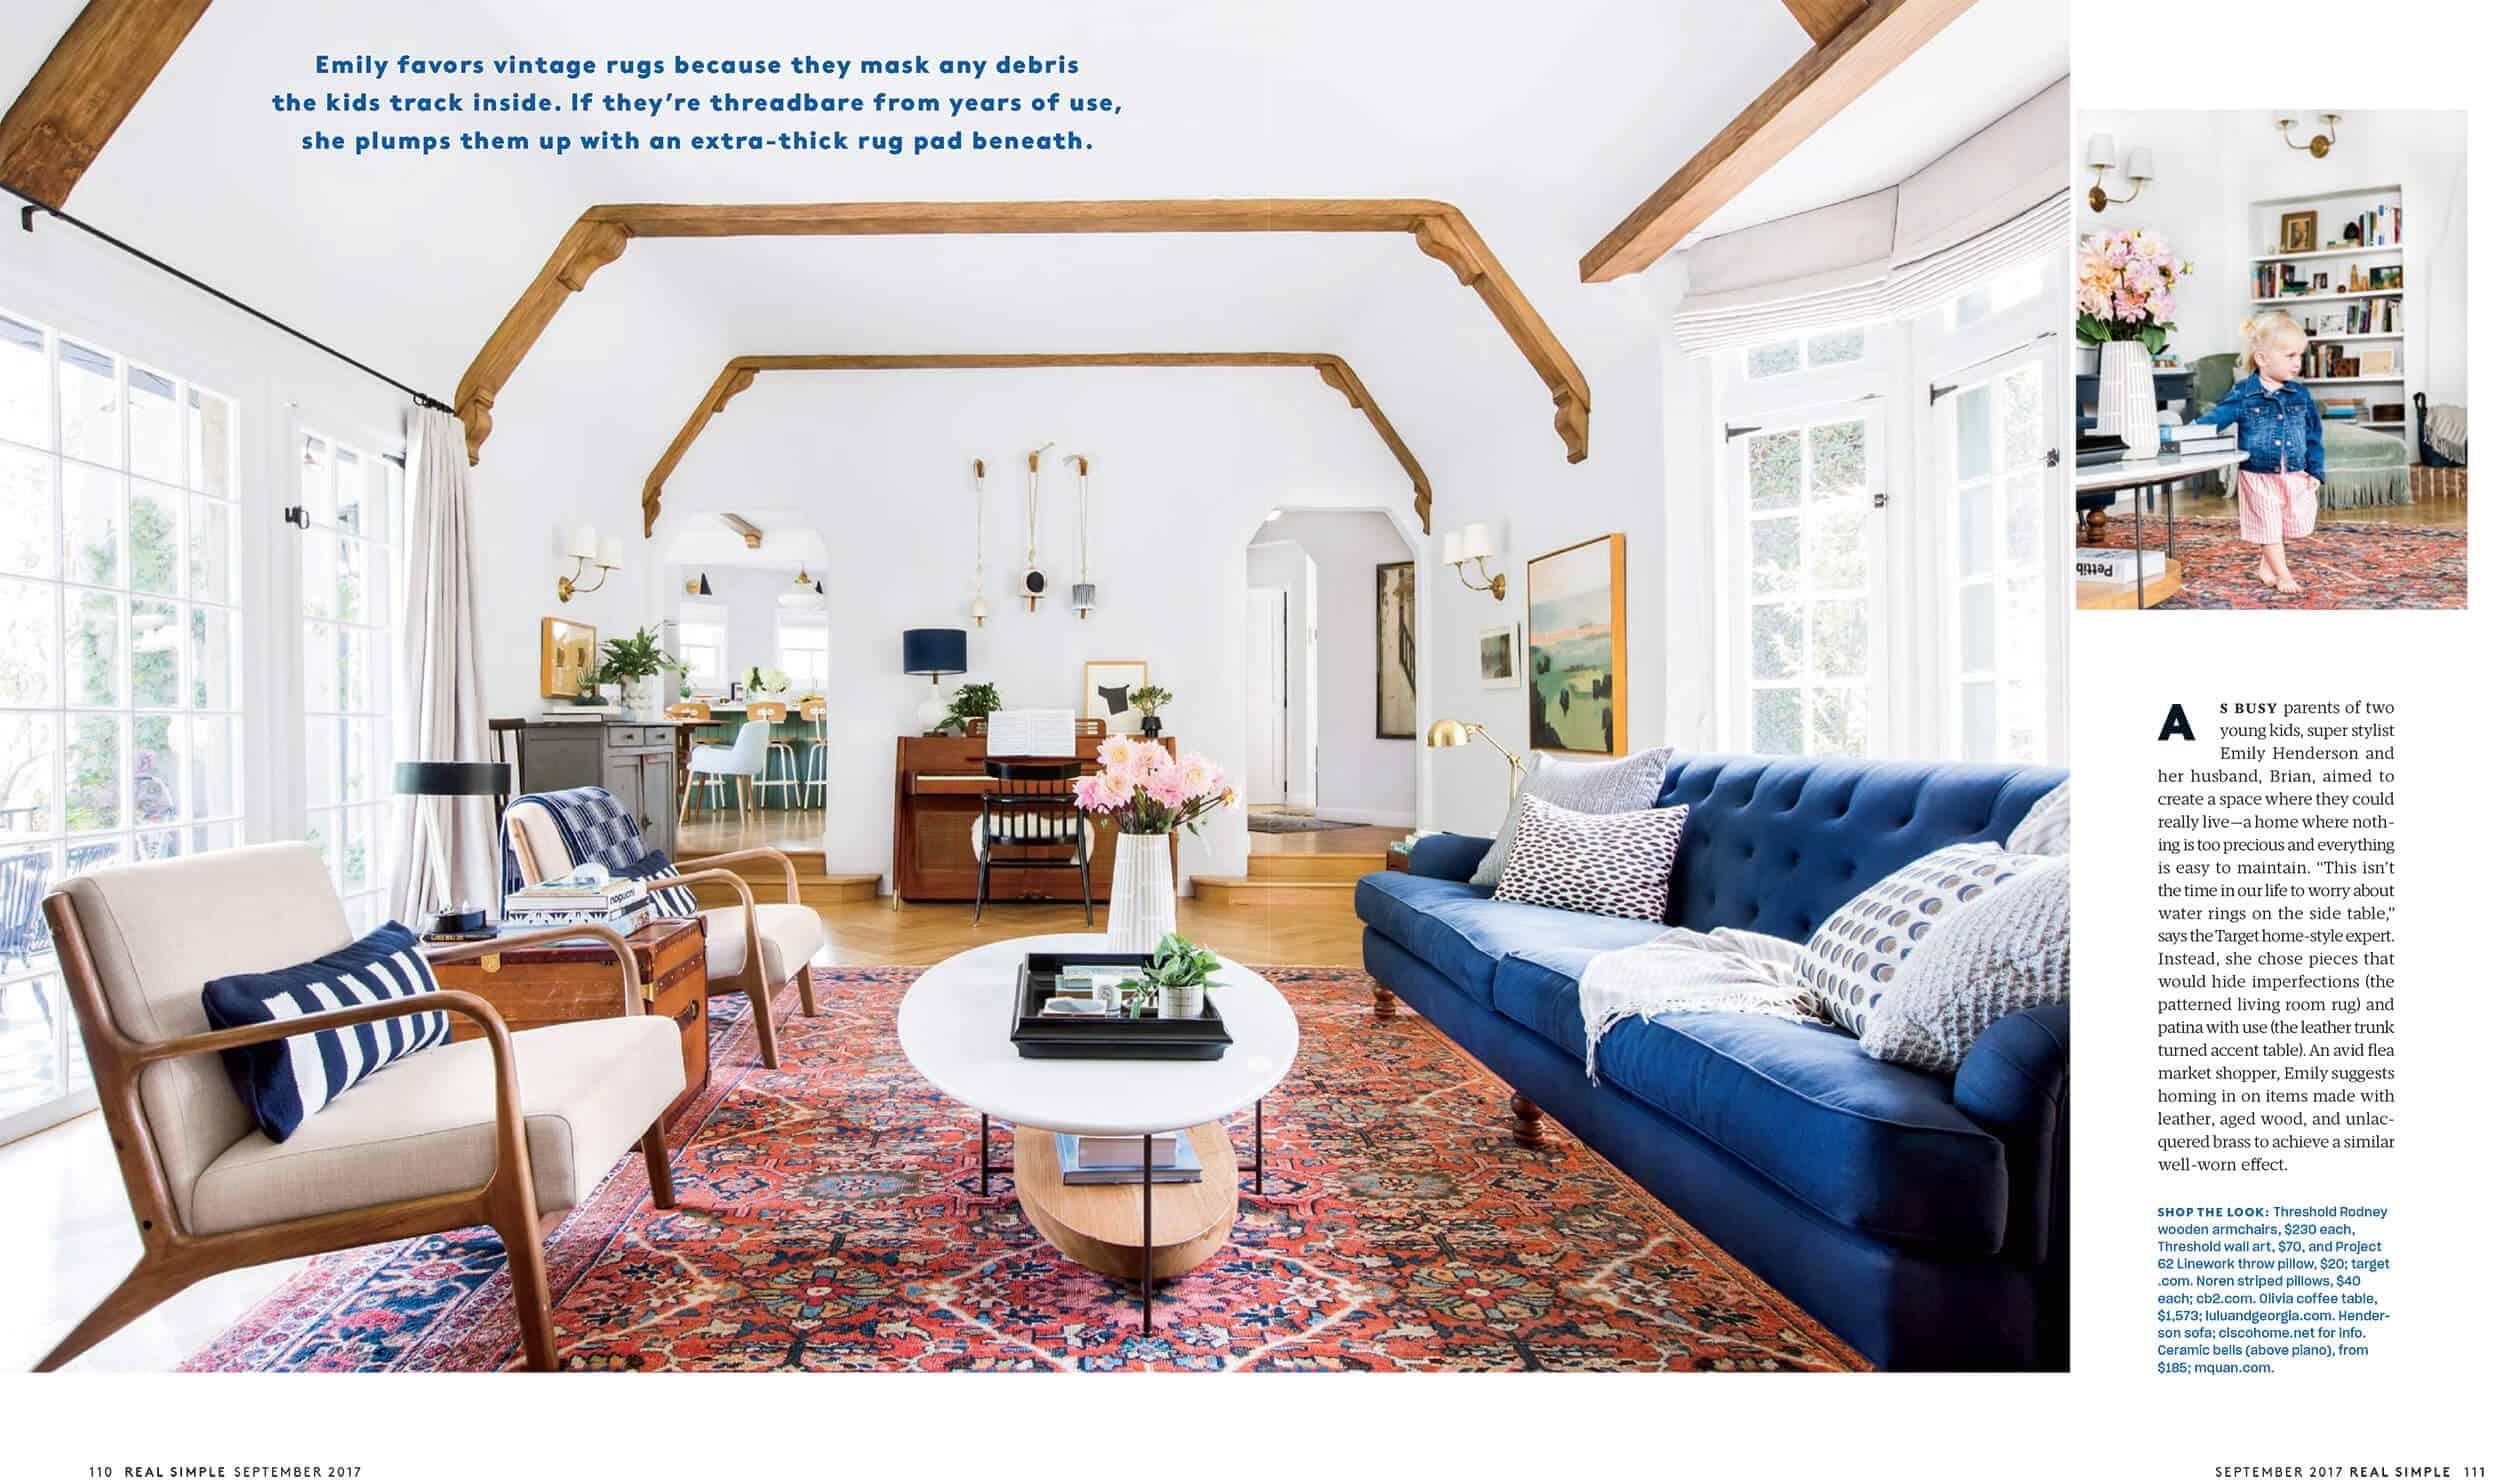 Emily Henderson Real Simple Magazine Sneak Peek 2